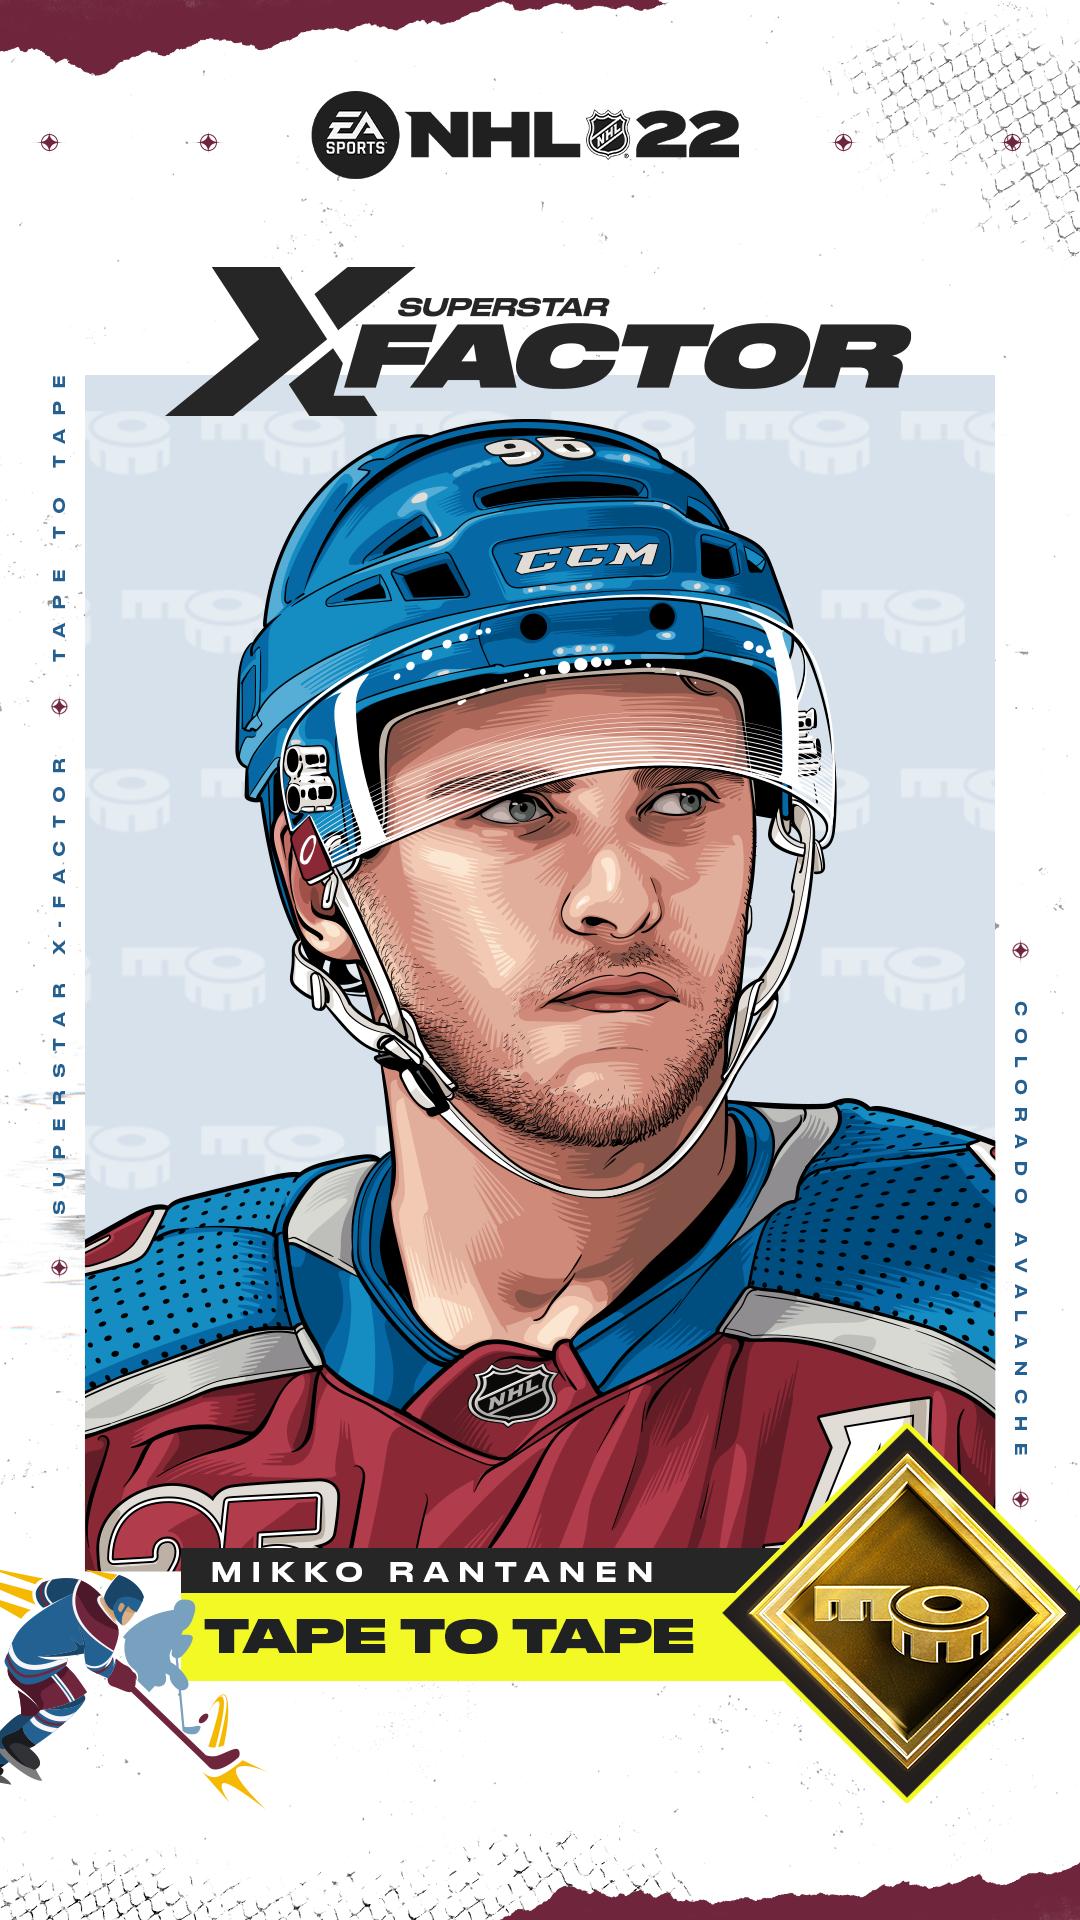 NHL22_XFactor_MikkoRantanen_9x16